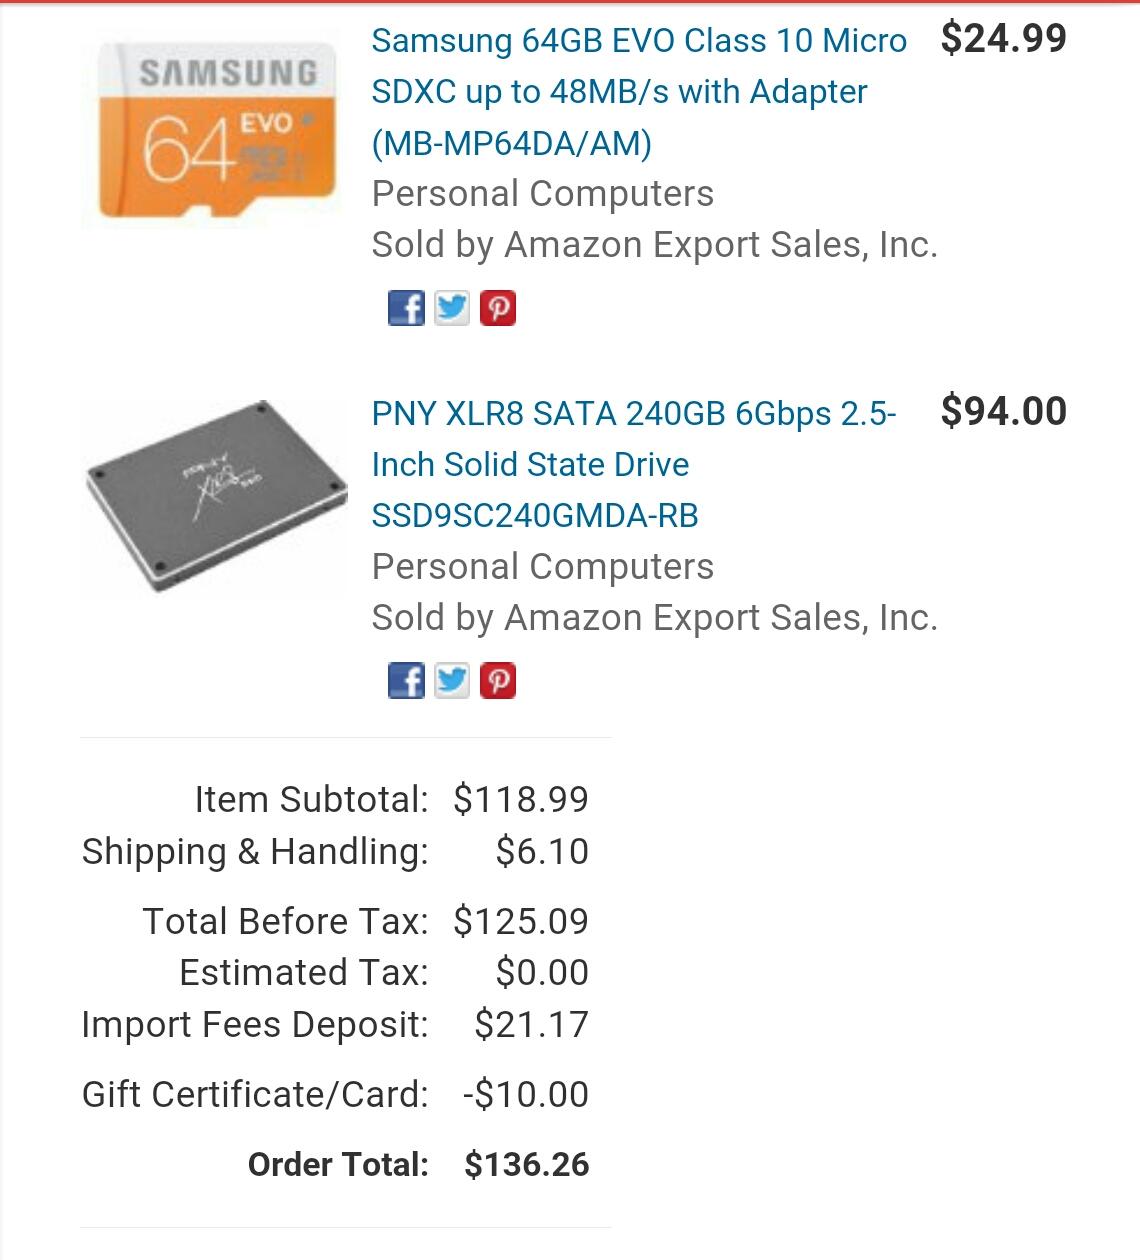 AMAZON: disco duro SATA pny XLR8 SSD 240GB 6GB/s  $1,685